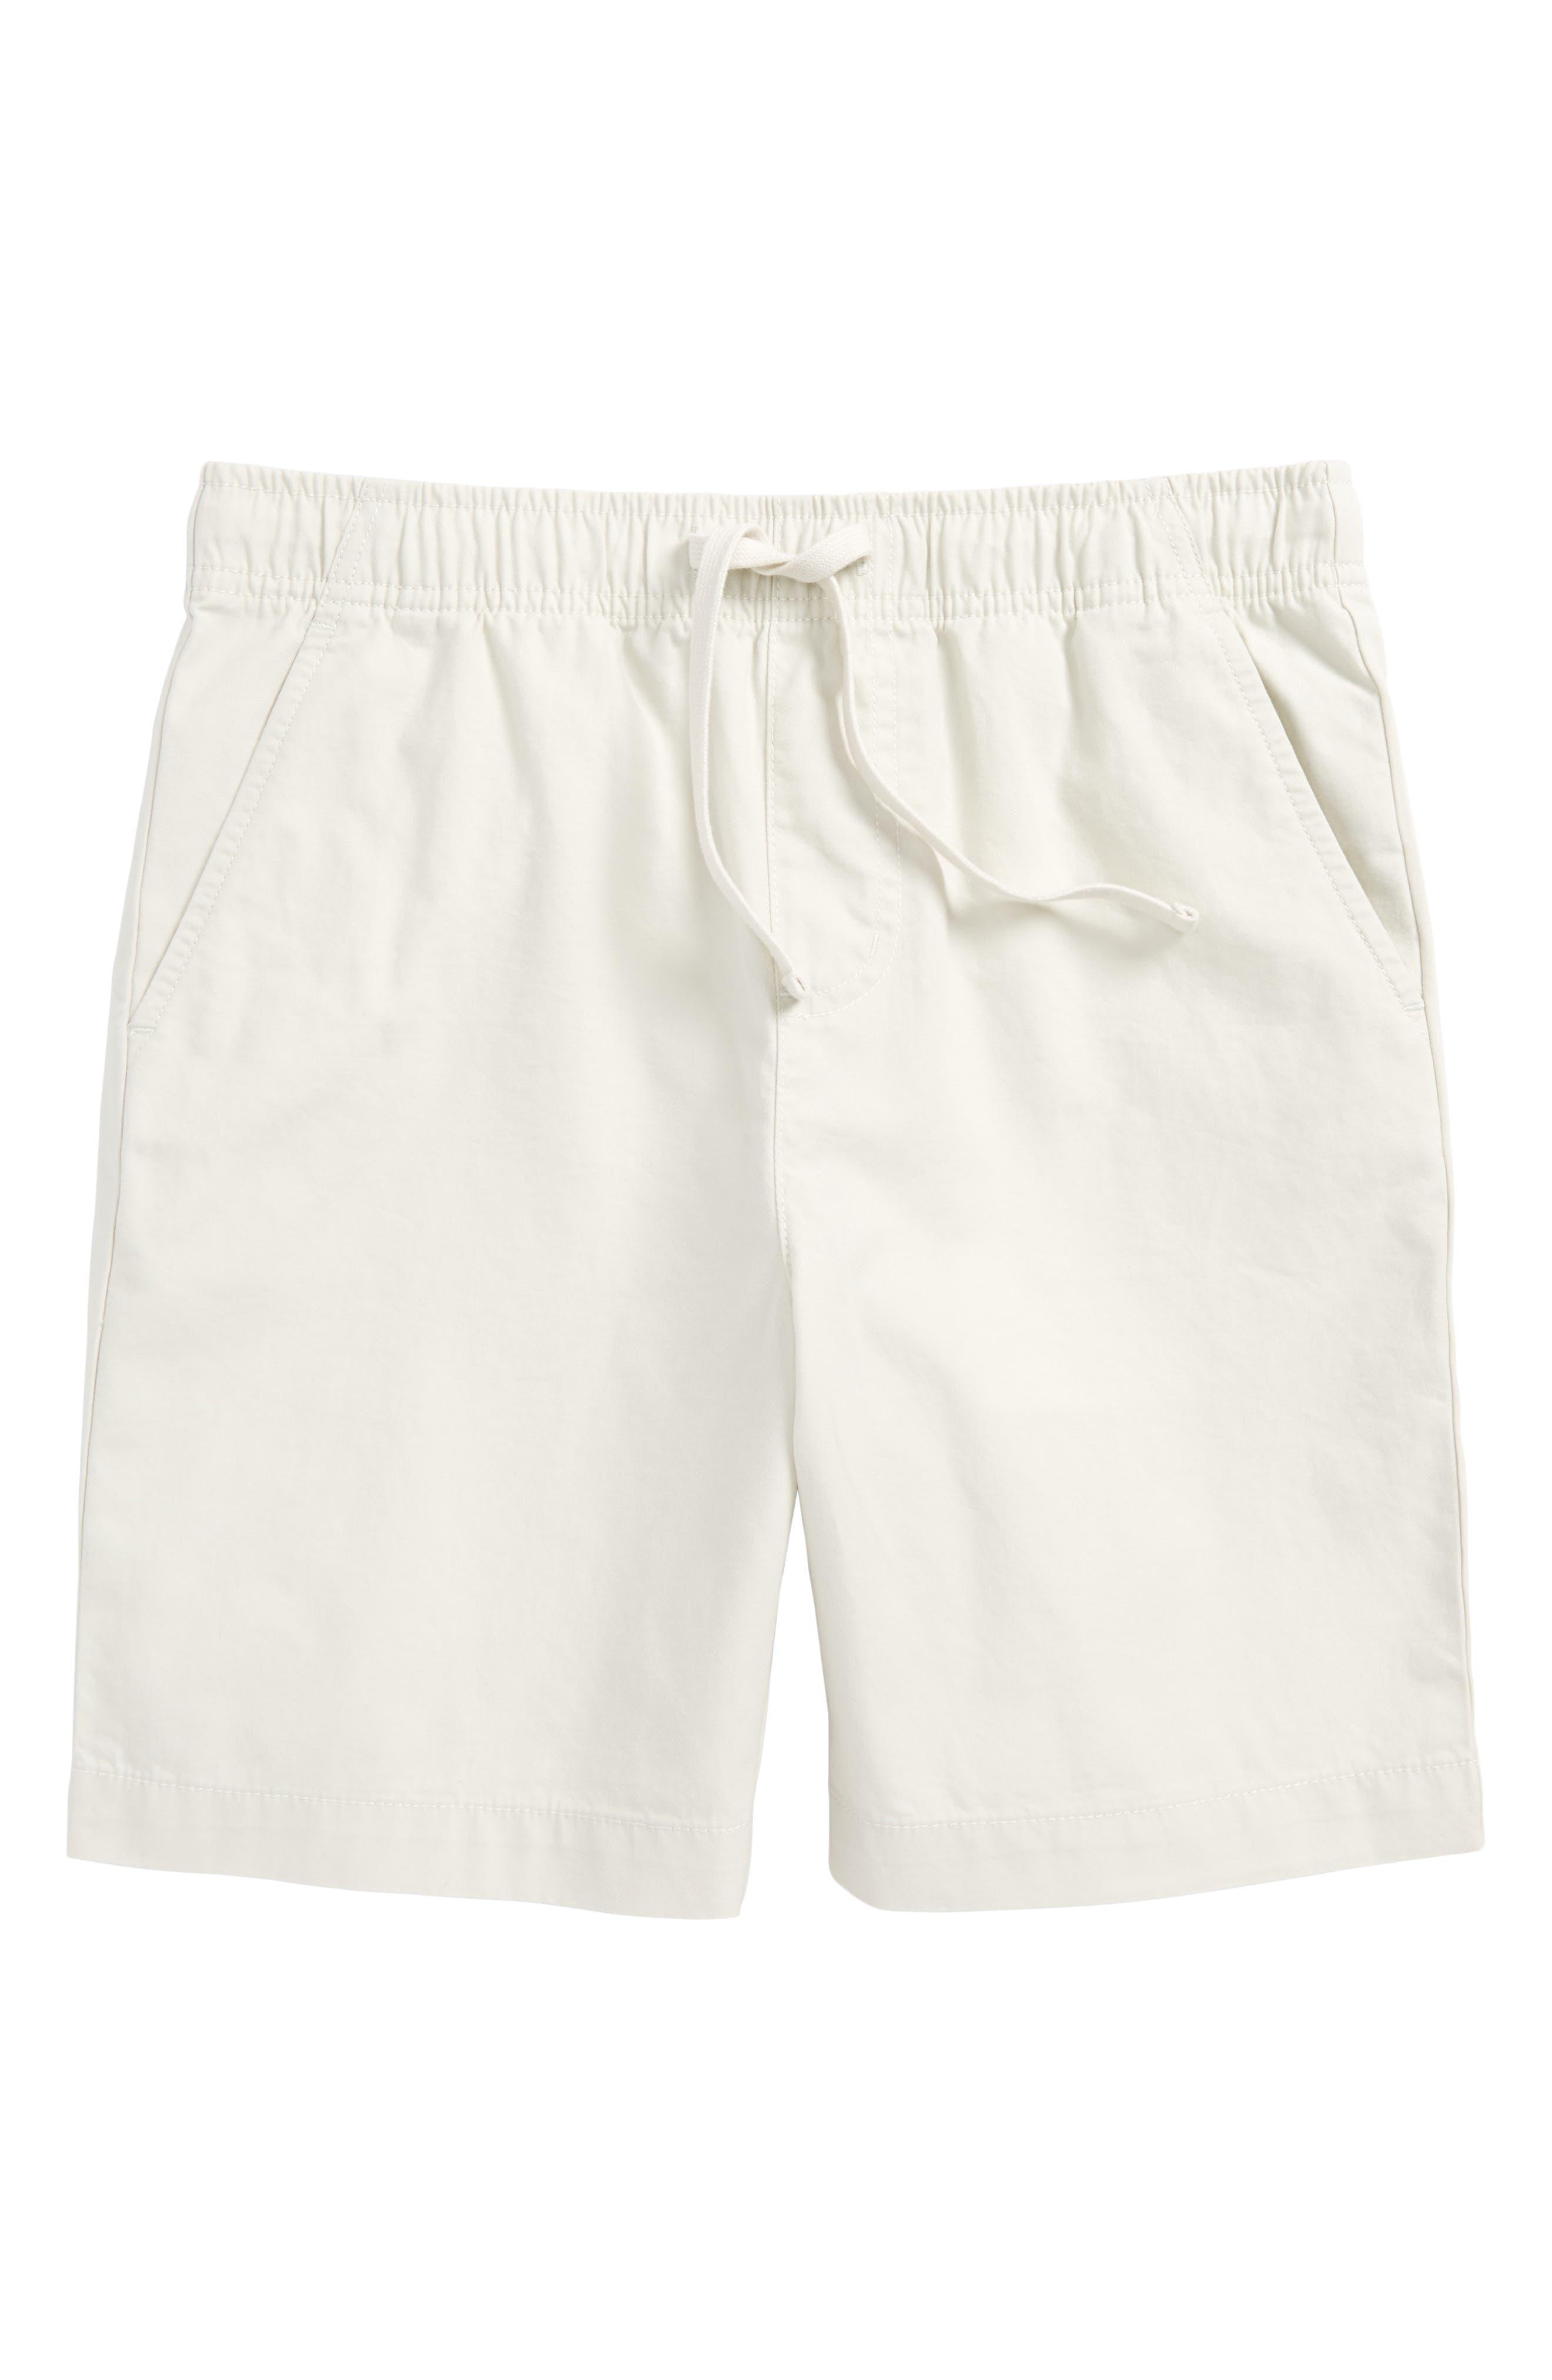 Elastic Waist Shorts,                             Main thumbnail 1, color,                             274